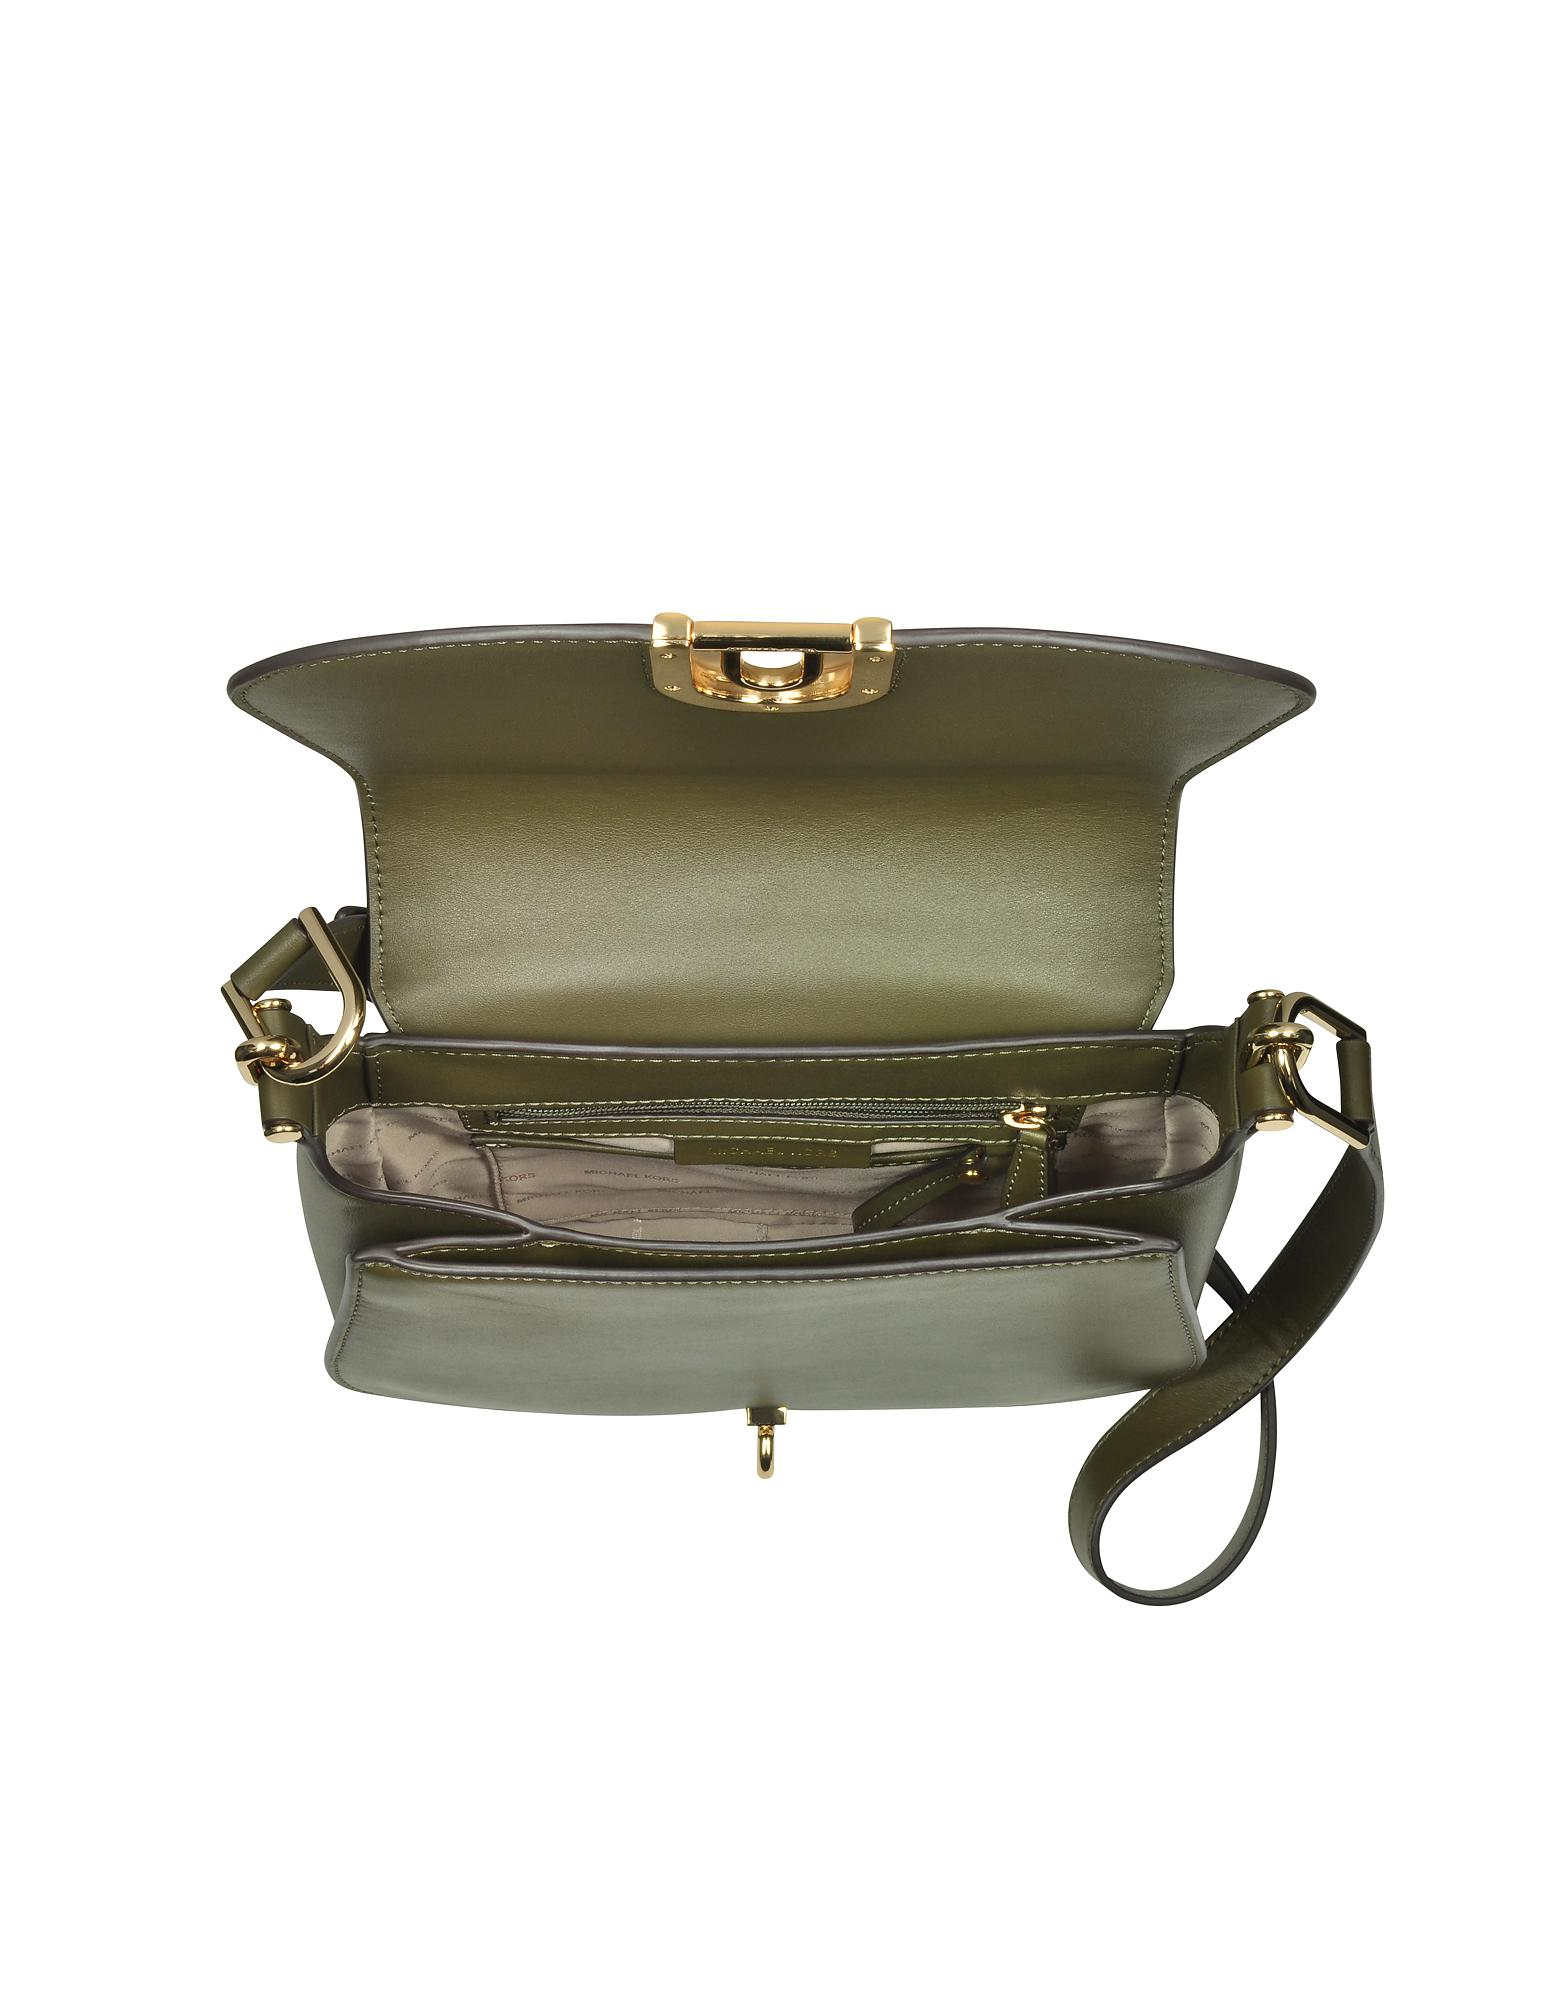 c5c5889255e2 Michael Kors Delfina Large Olive Green Leather Saddle Bag in Green ...